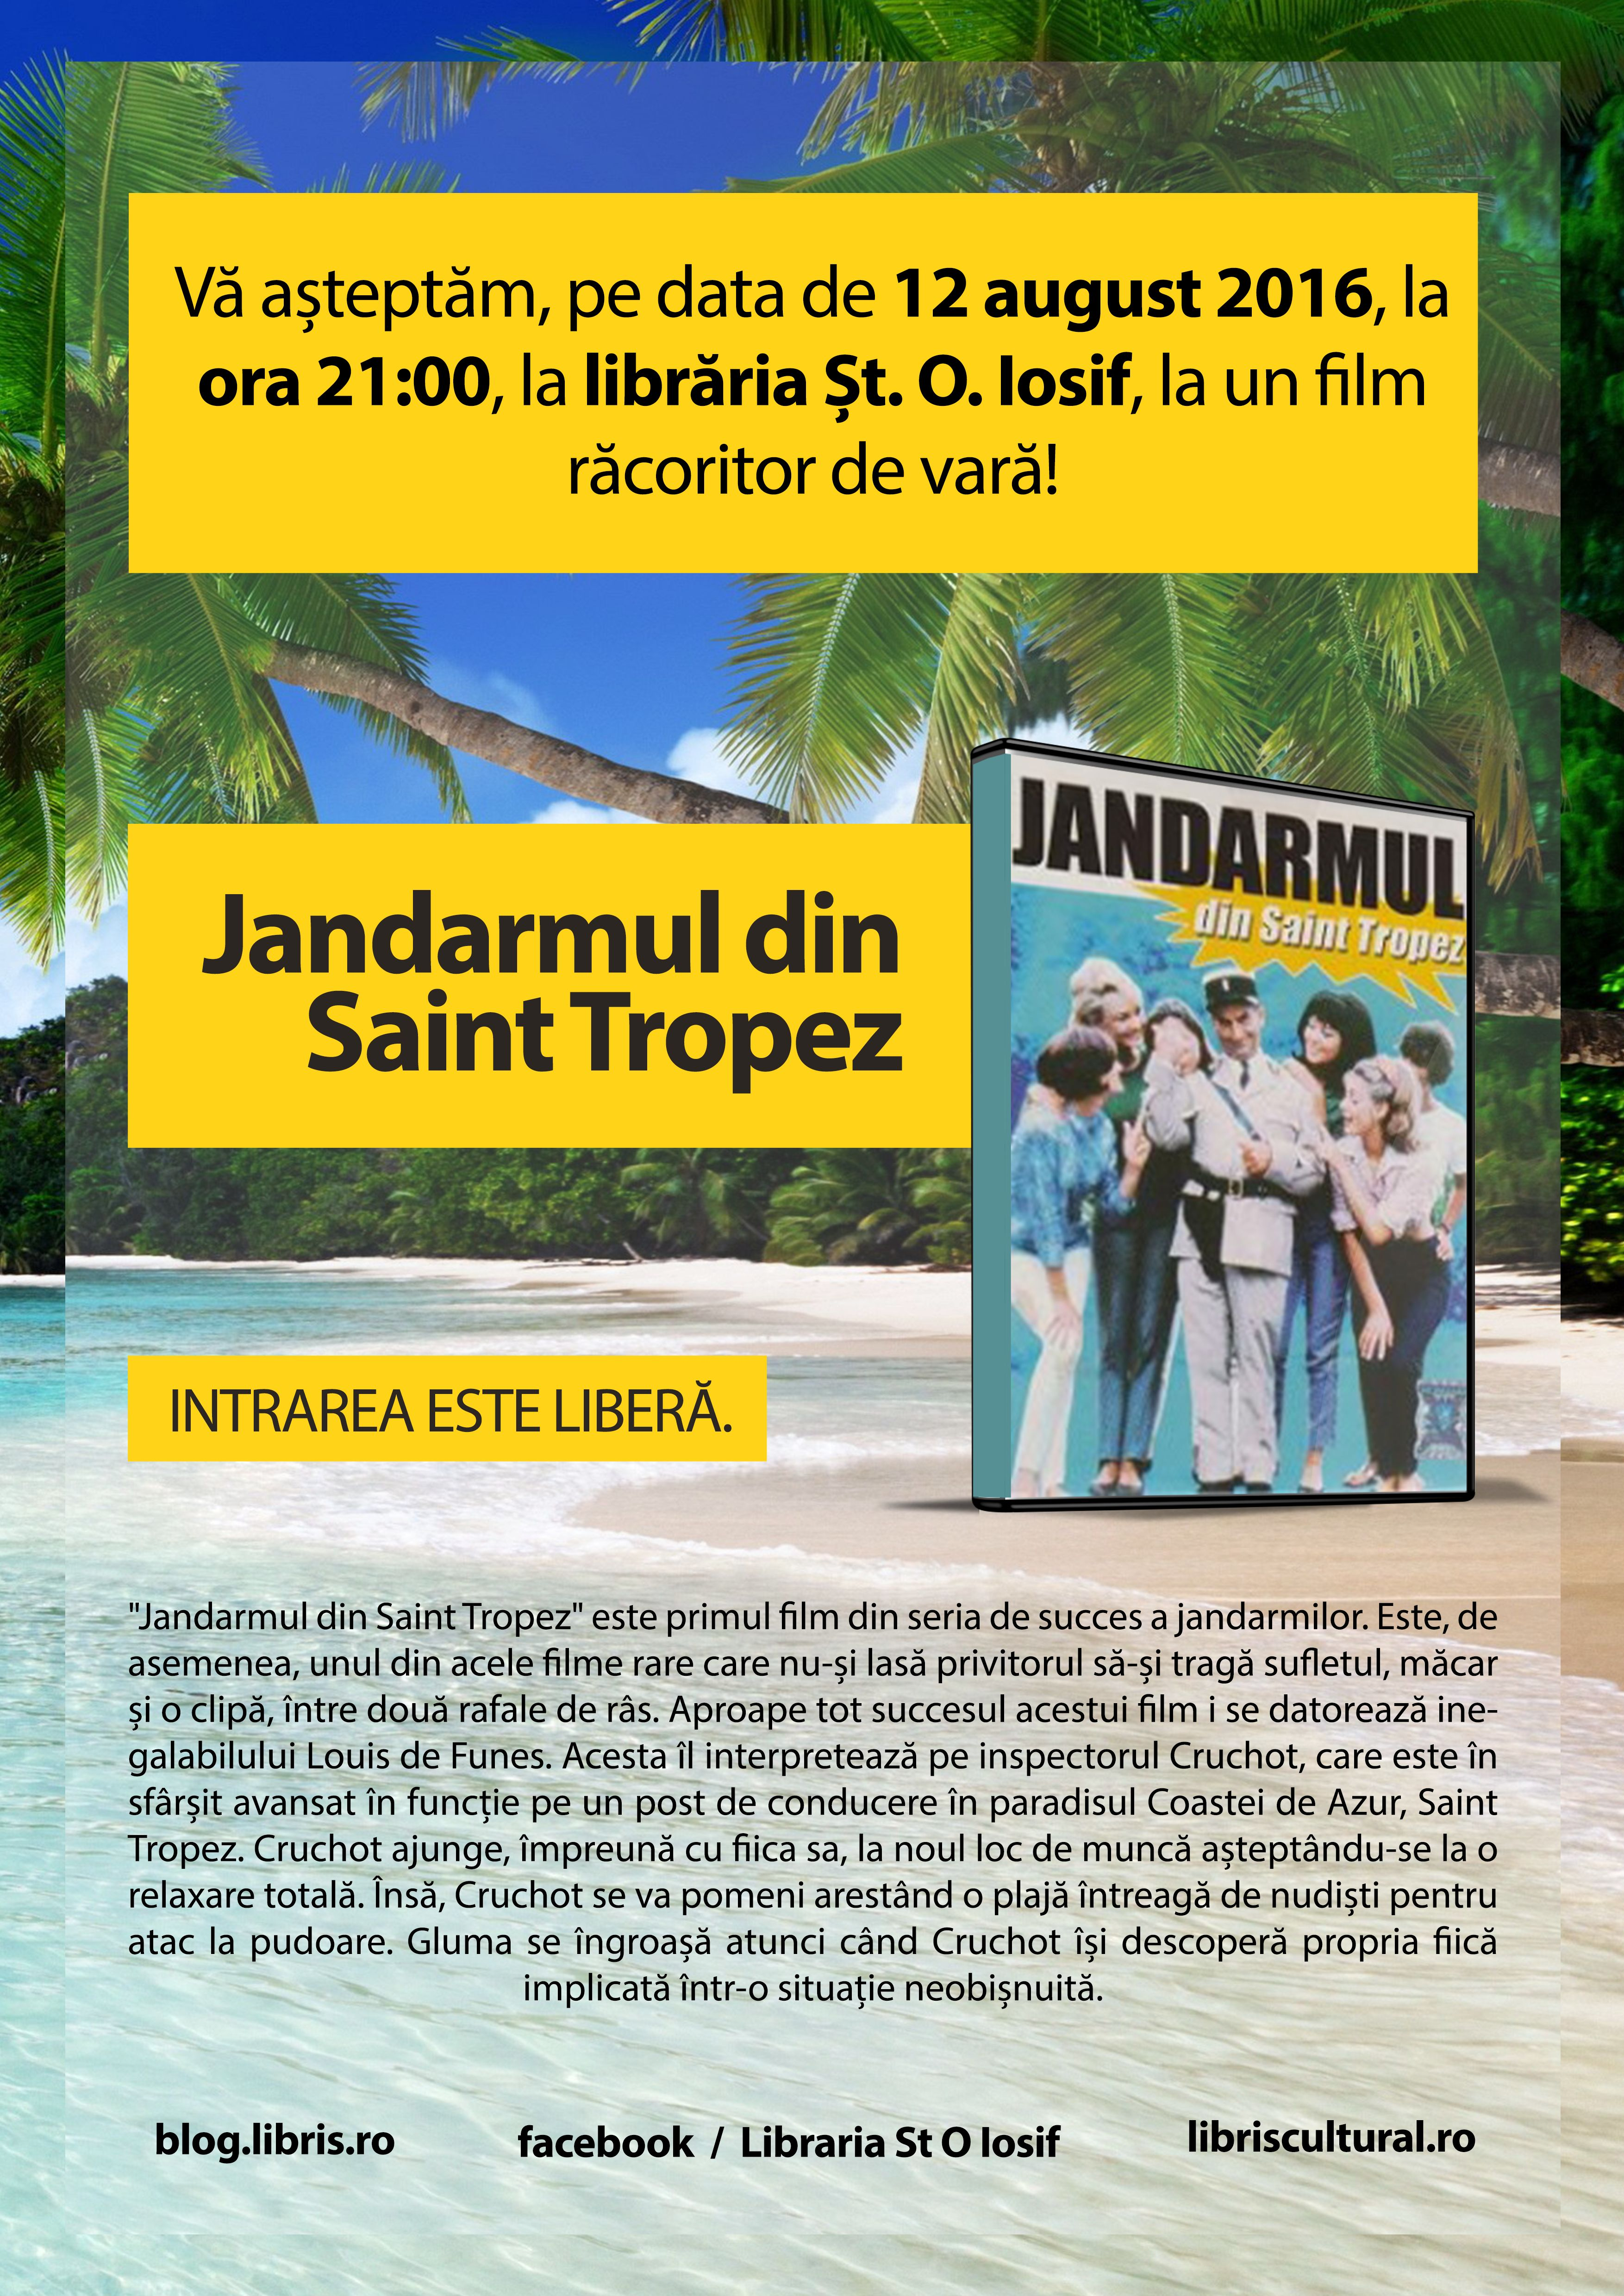 cinemate jandarmul din saint tropez